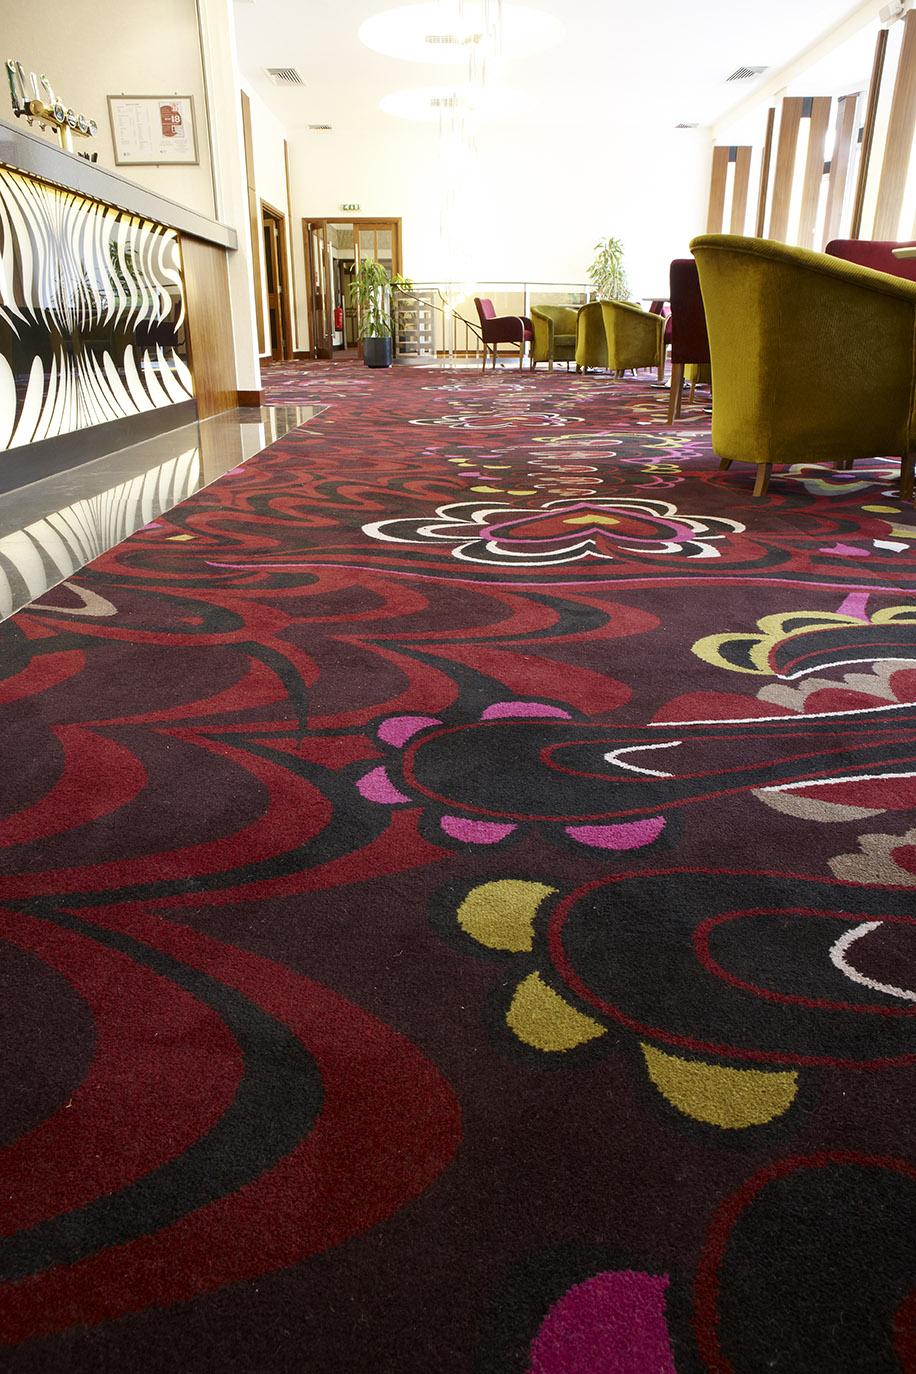 Imperial London Hotel Wilton Carpets